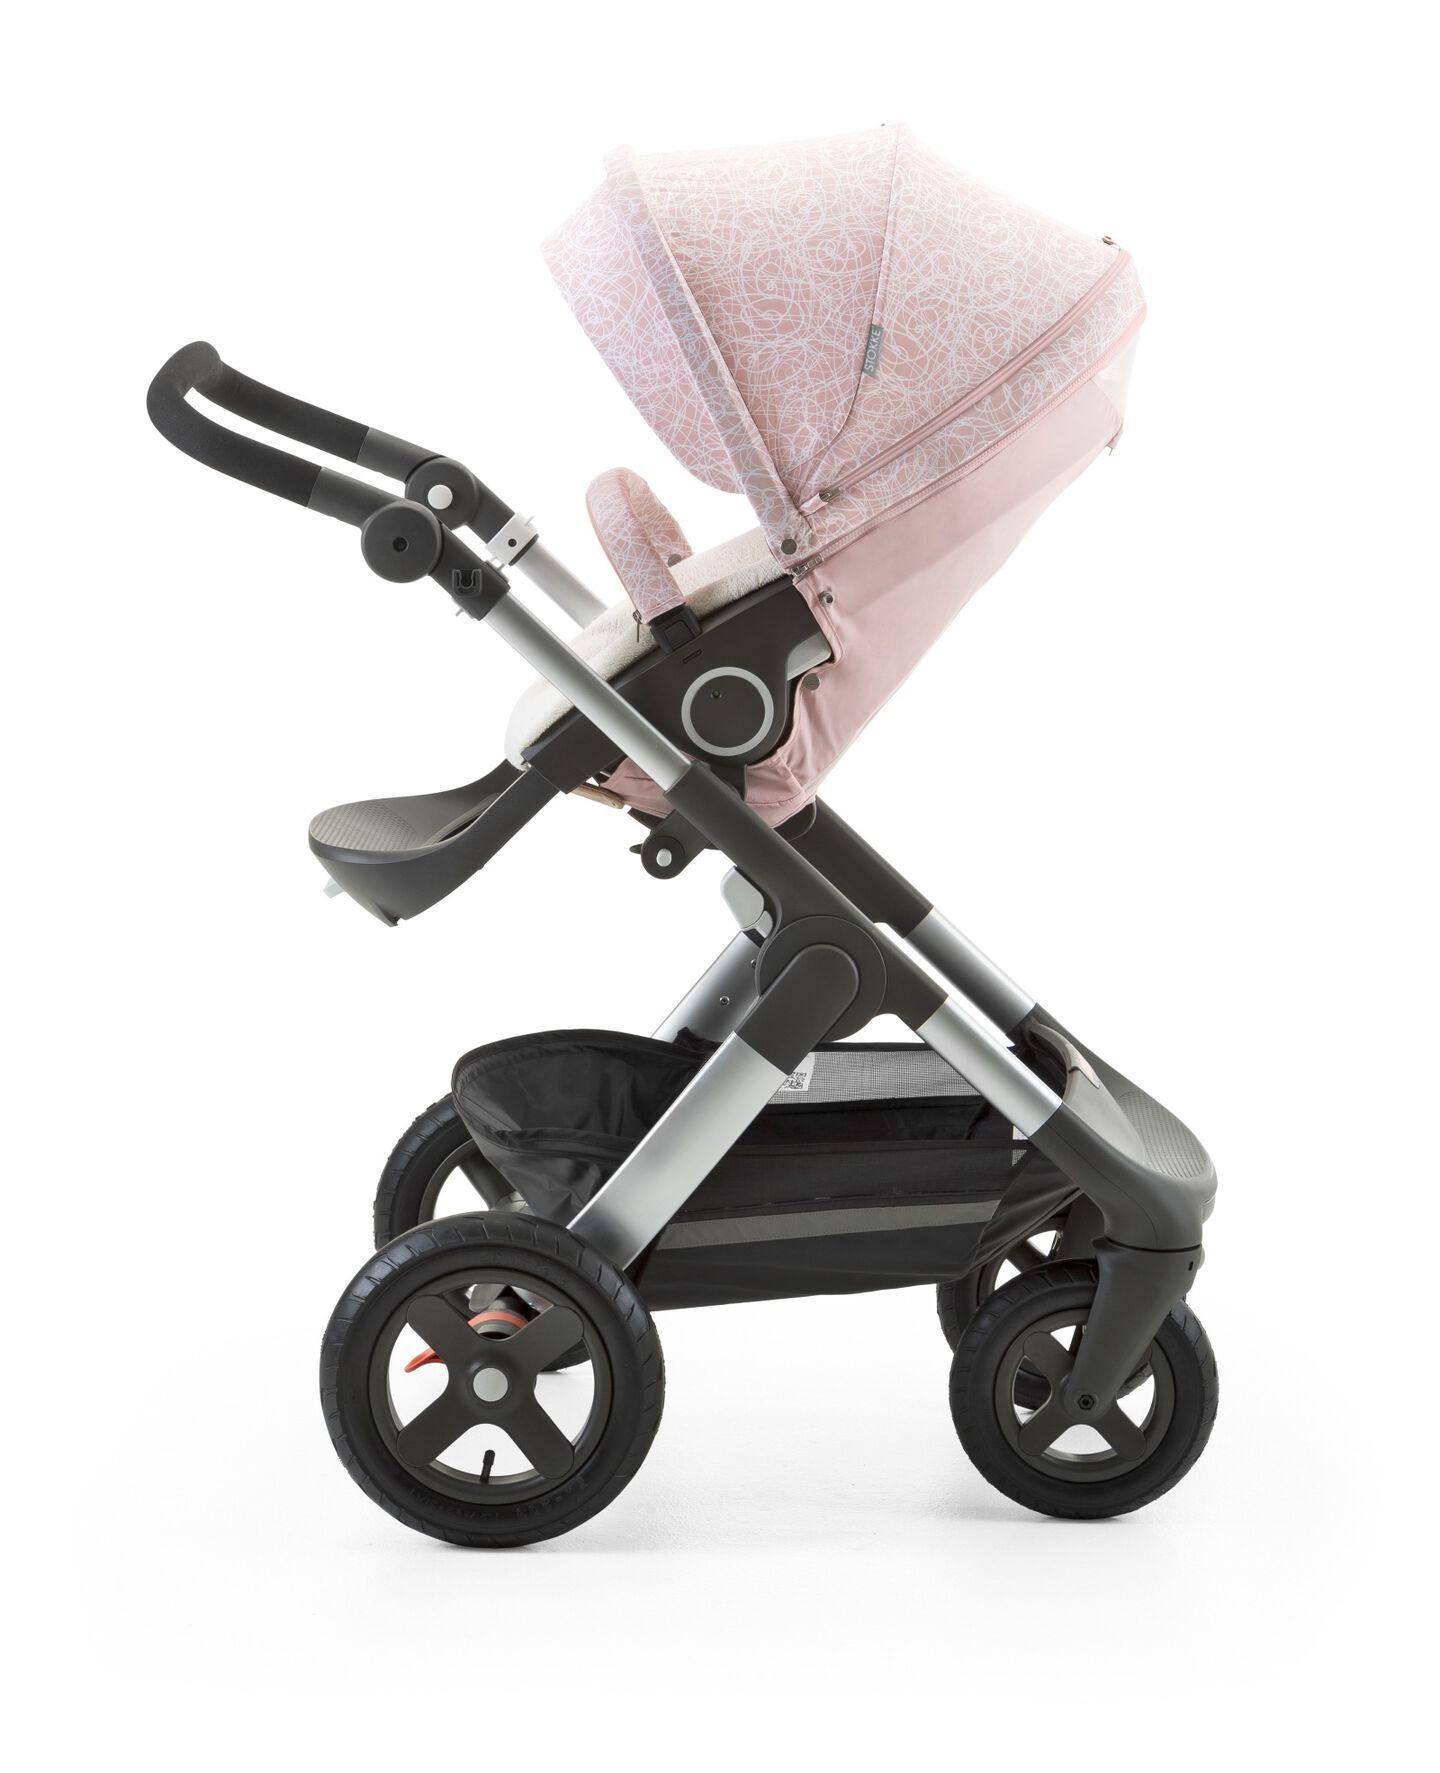 Stokke® Trailz™ with Stokke® Stroller Summer Kit Scribble Faded Pink.